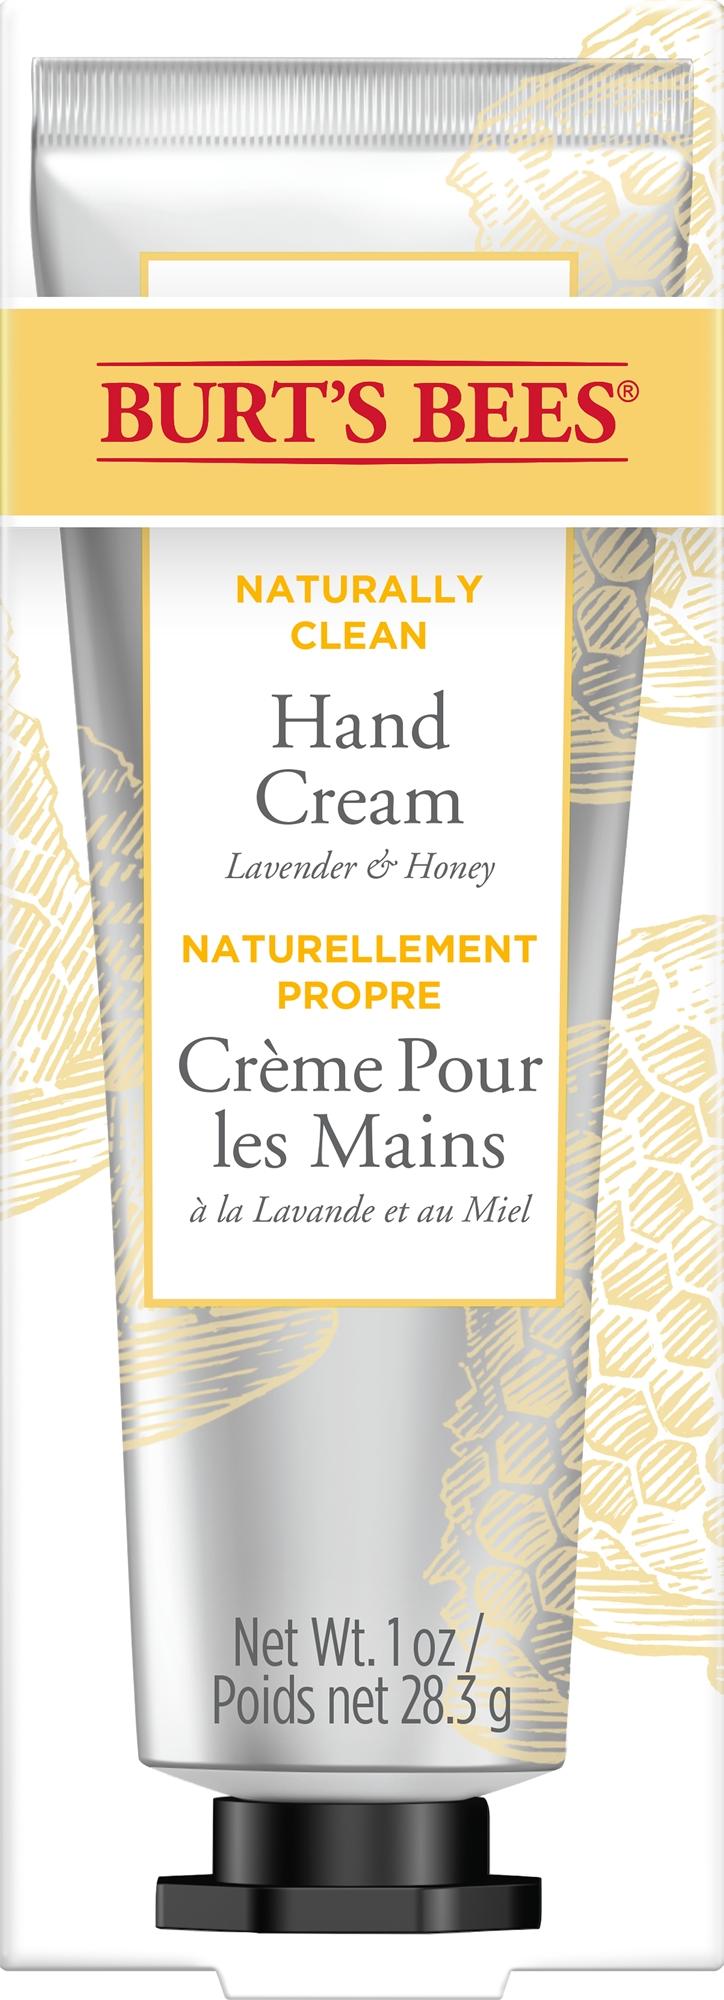 Naturally Clean Hand Cream 28.3g